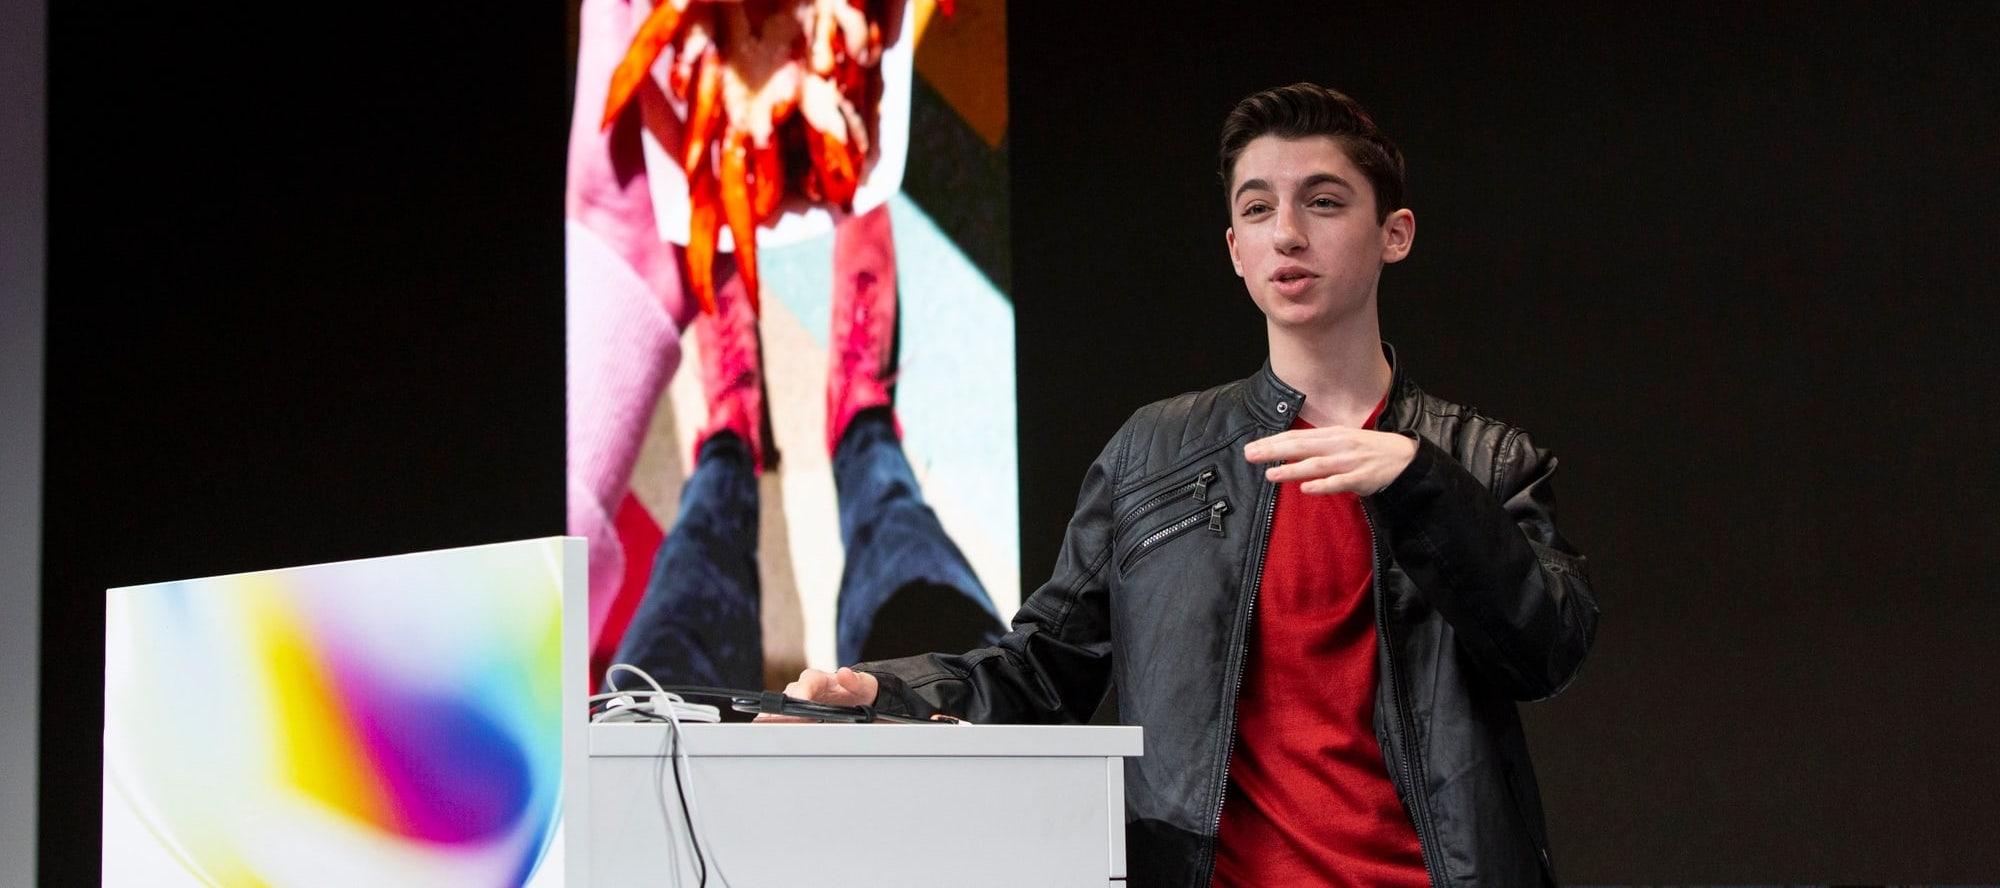 Eitan Bernath speaking at the Instagram NEXT conference in October 2019